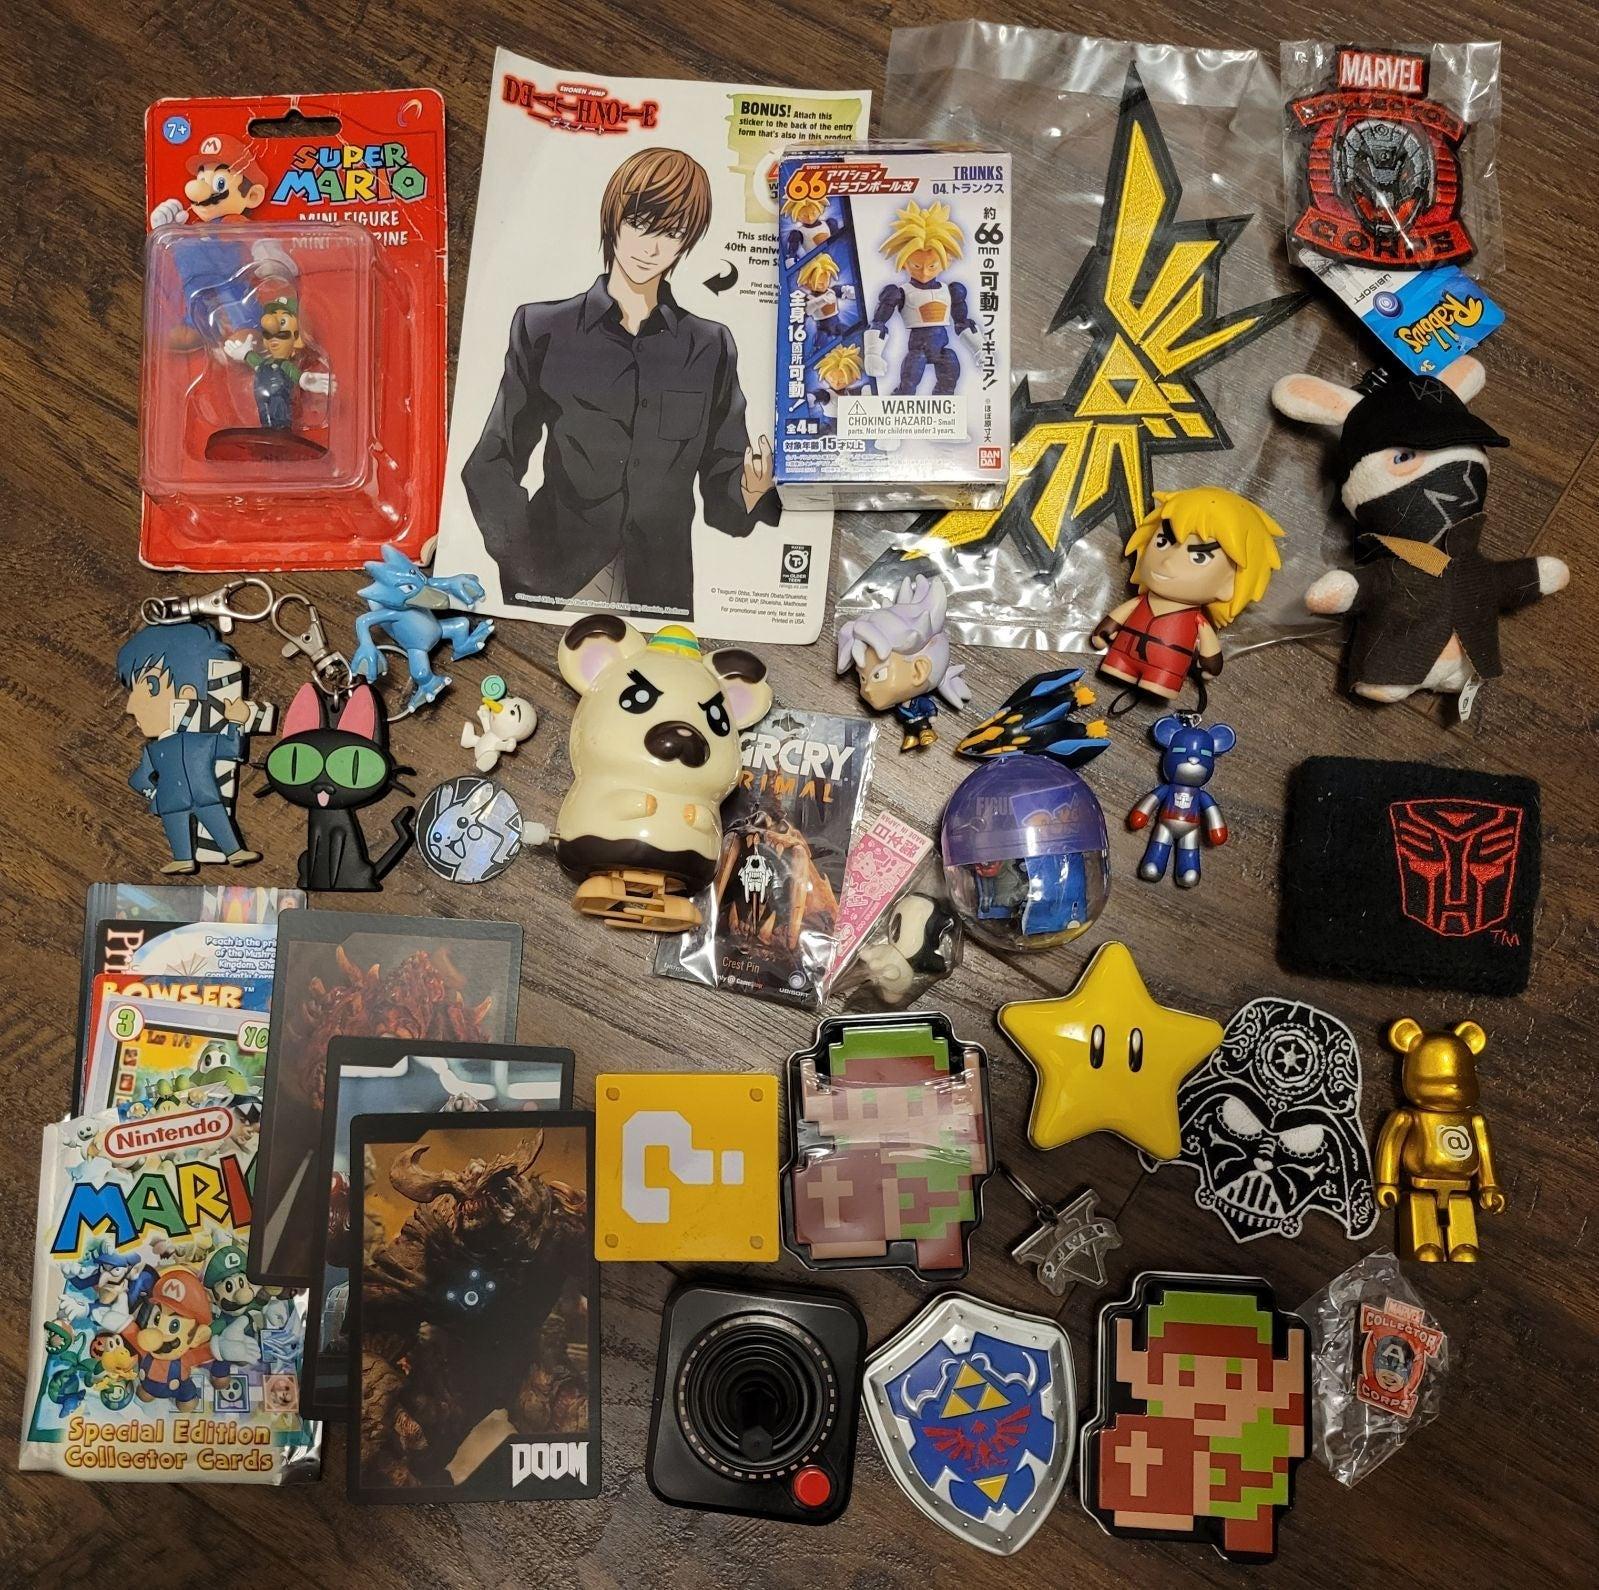 Anime / Videogame Merch Lot